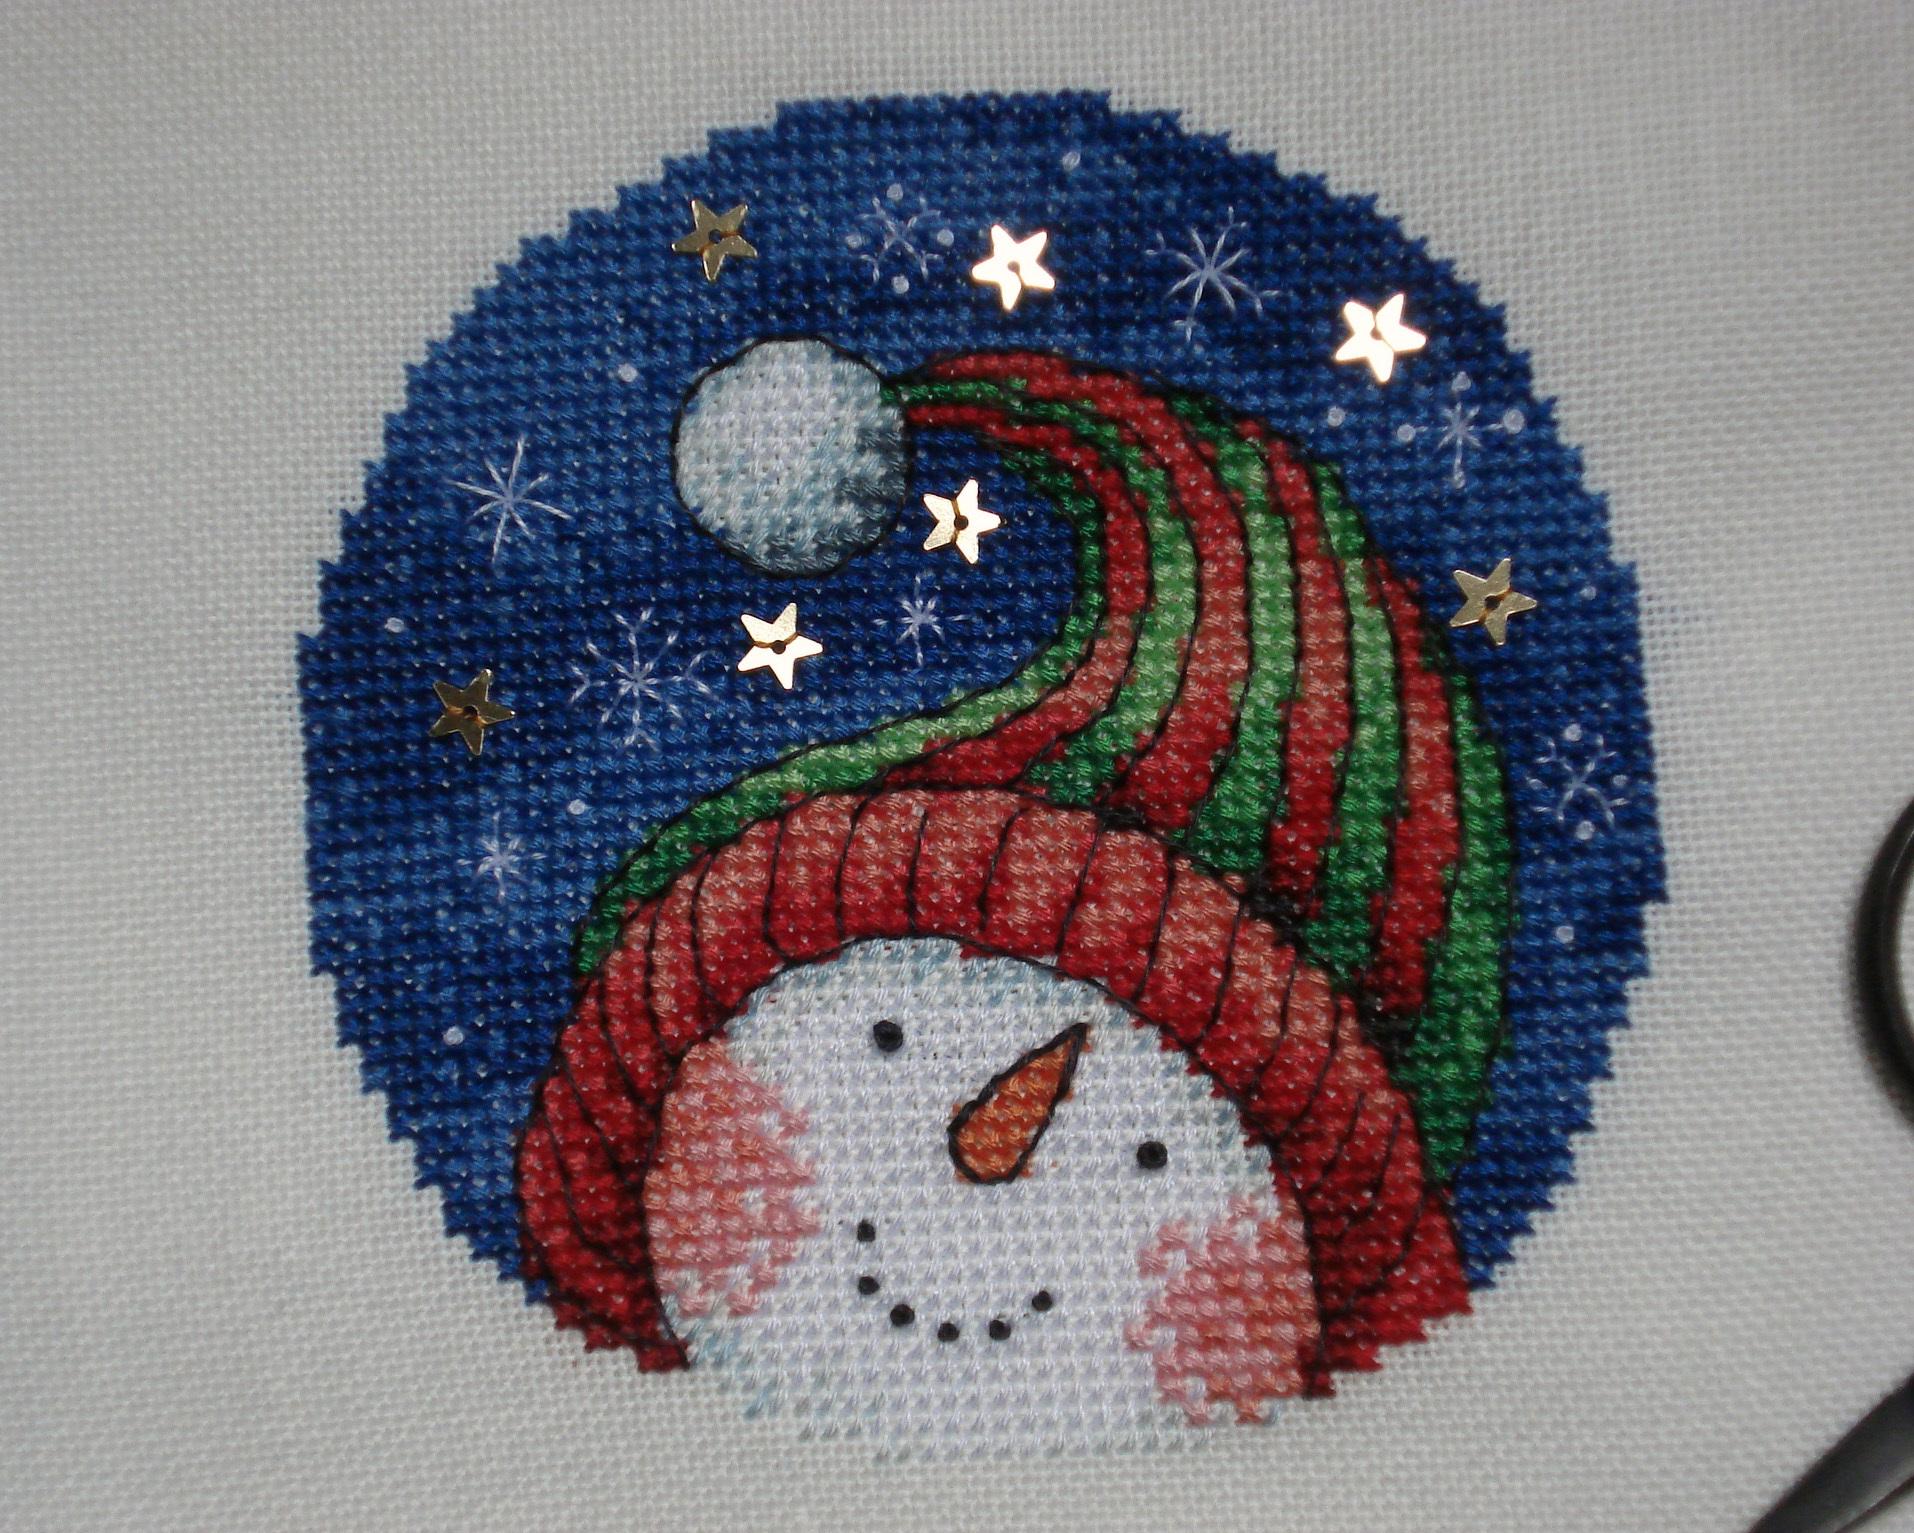 Snowman ornament 3672165860 o